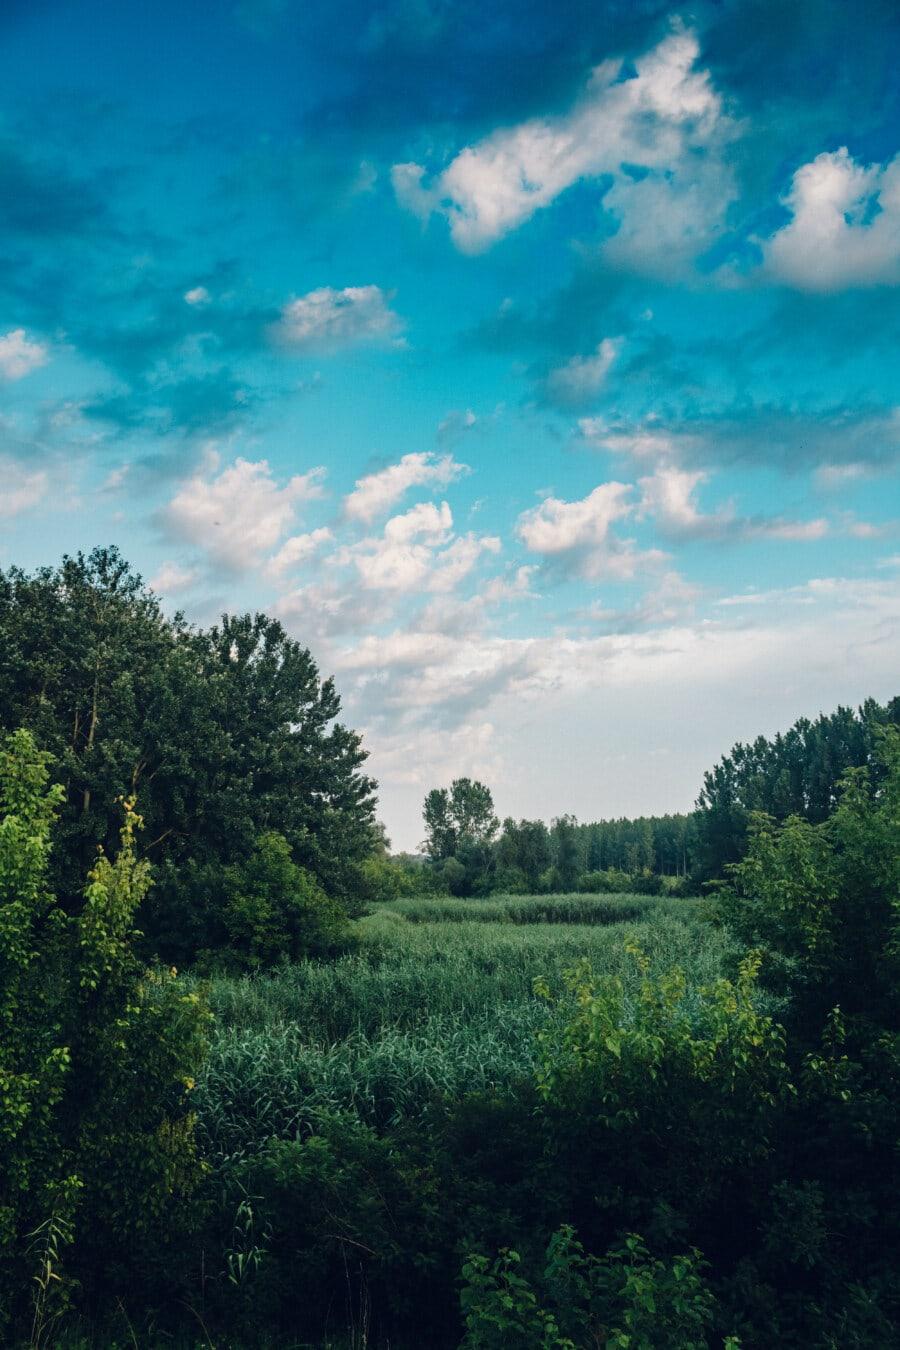 Sumpf, Marschland, Frühling, Grün, blauer Himmel, im freien, Natur, Struktur, Wald, Landschaft